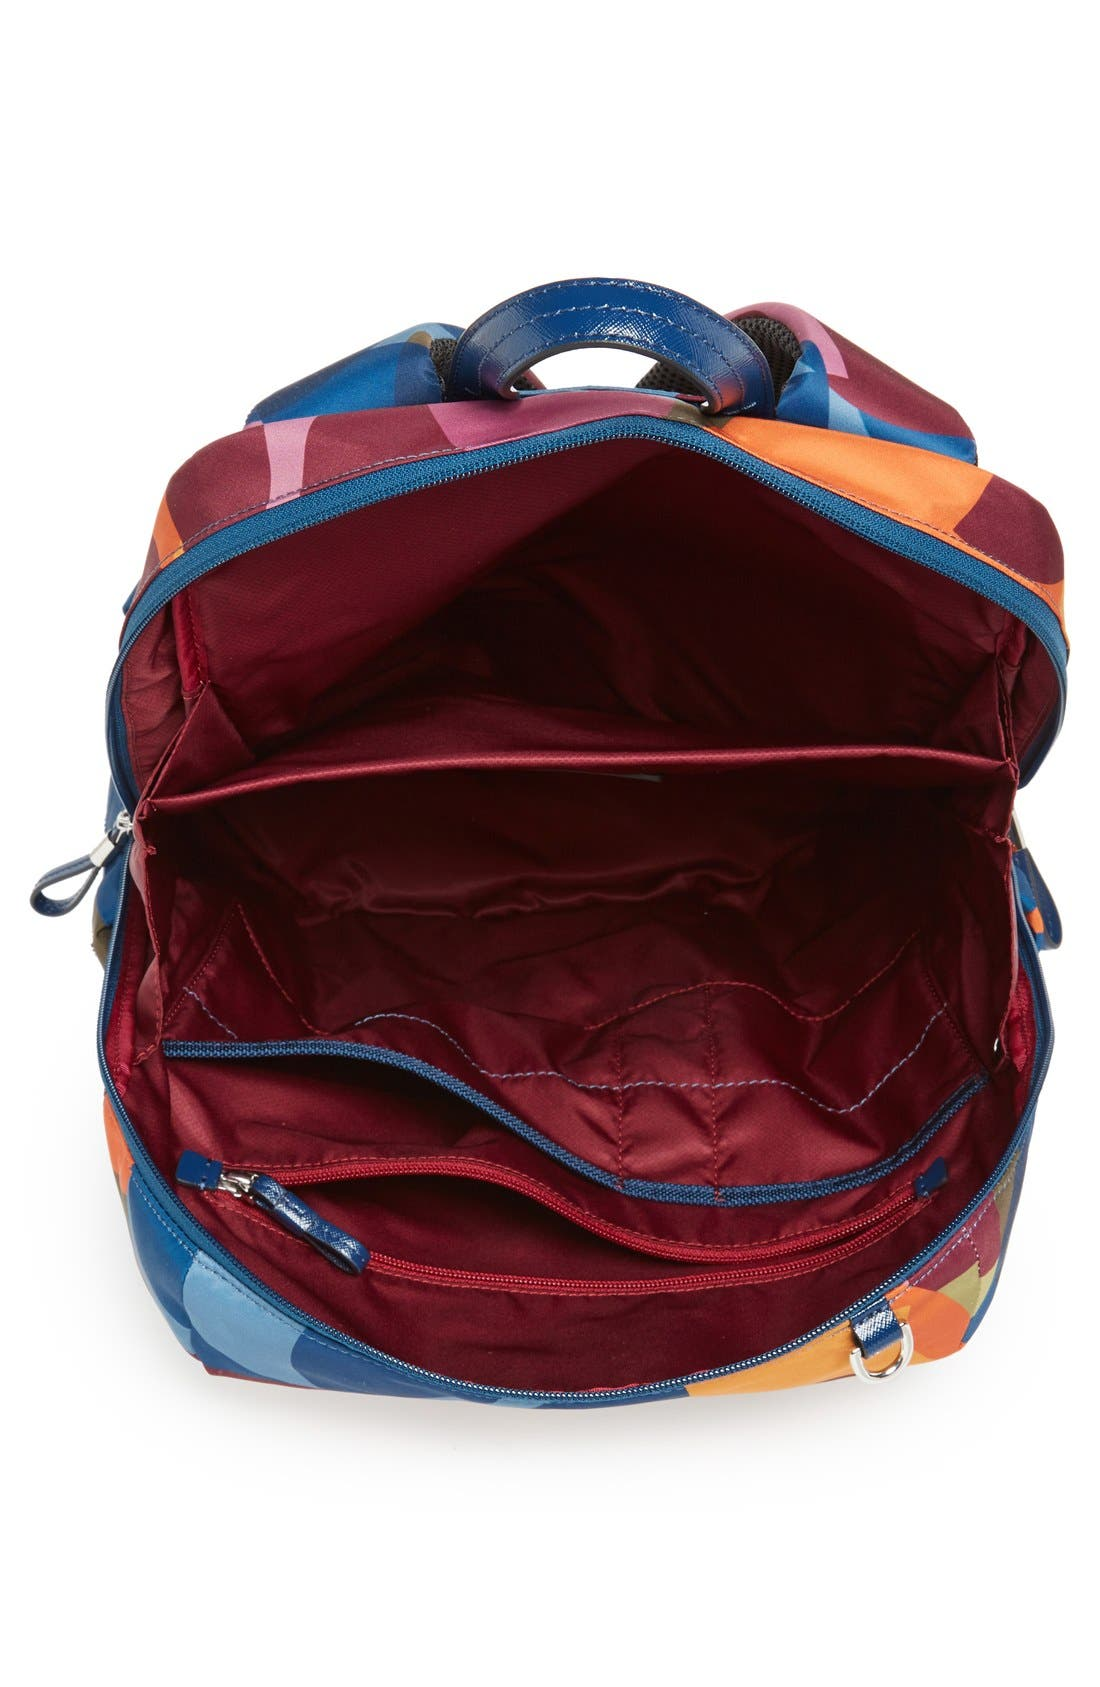 Calais Nylon 15-Inch Computer Commuter Backpack,                             Alternate thumbnail 86, color,